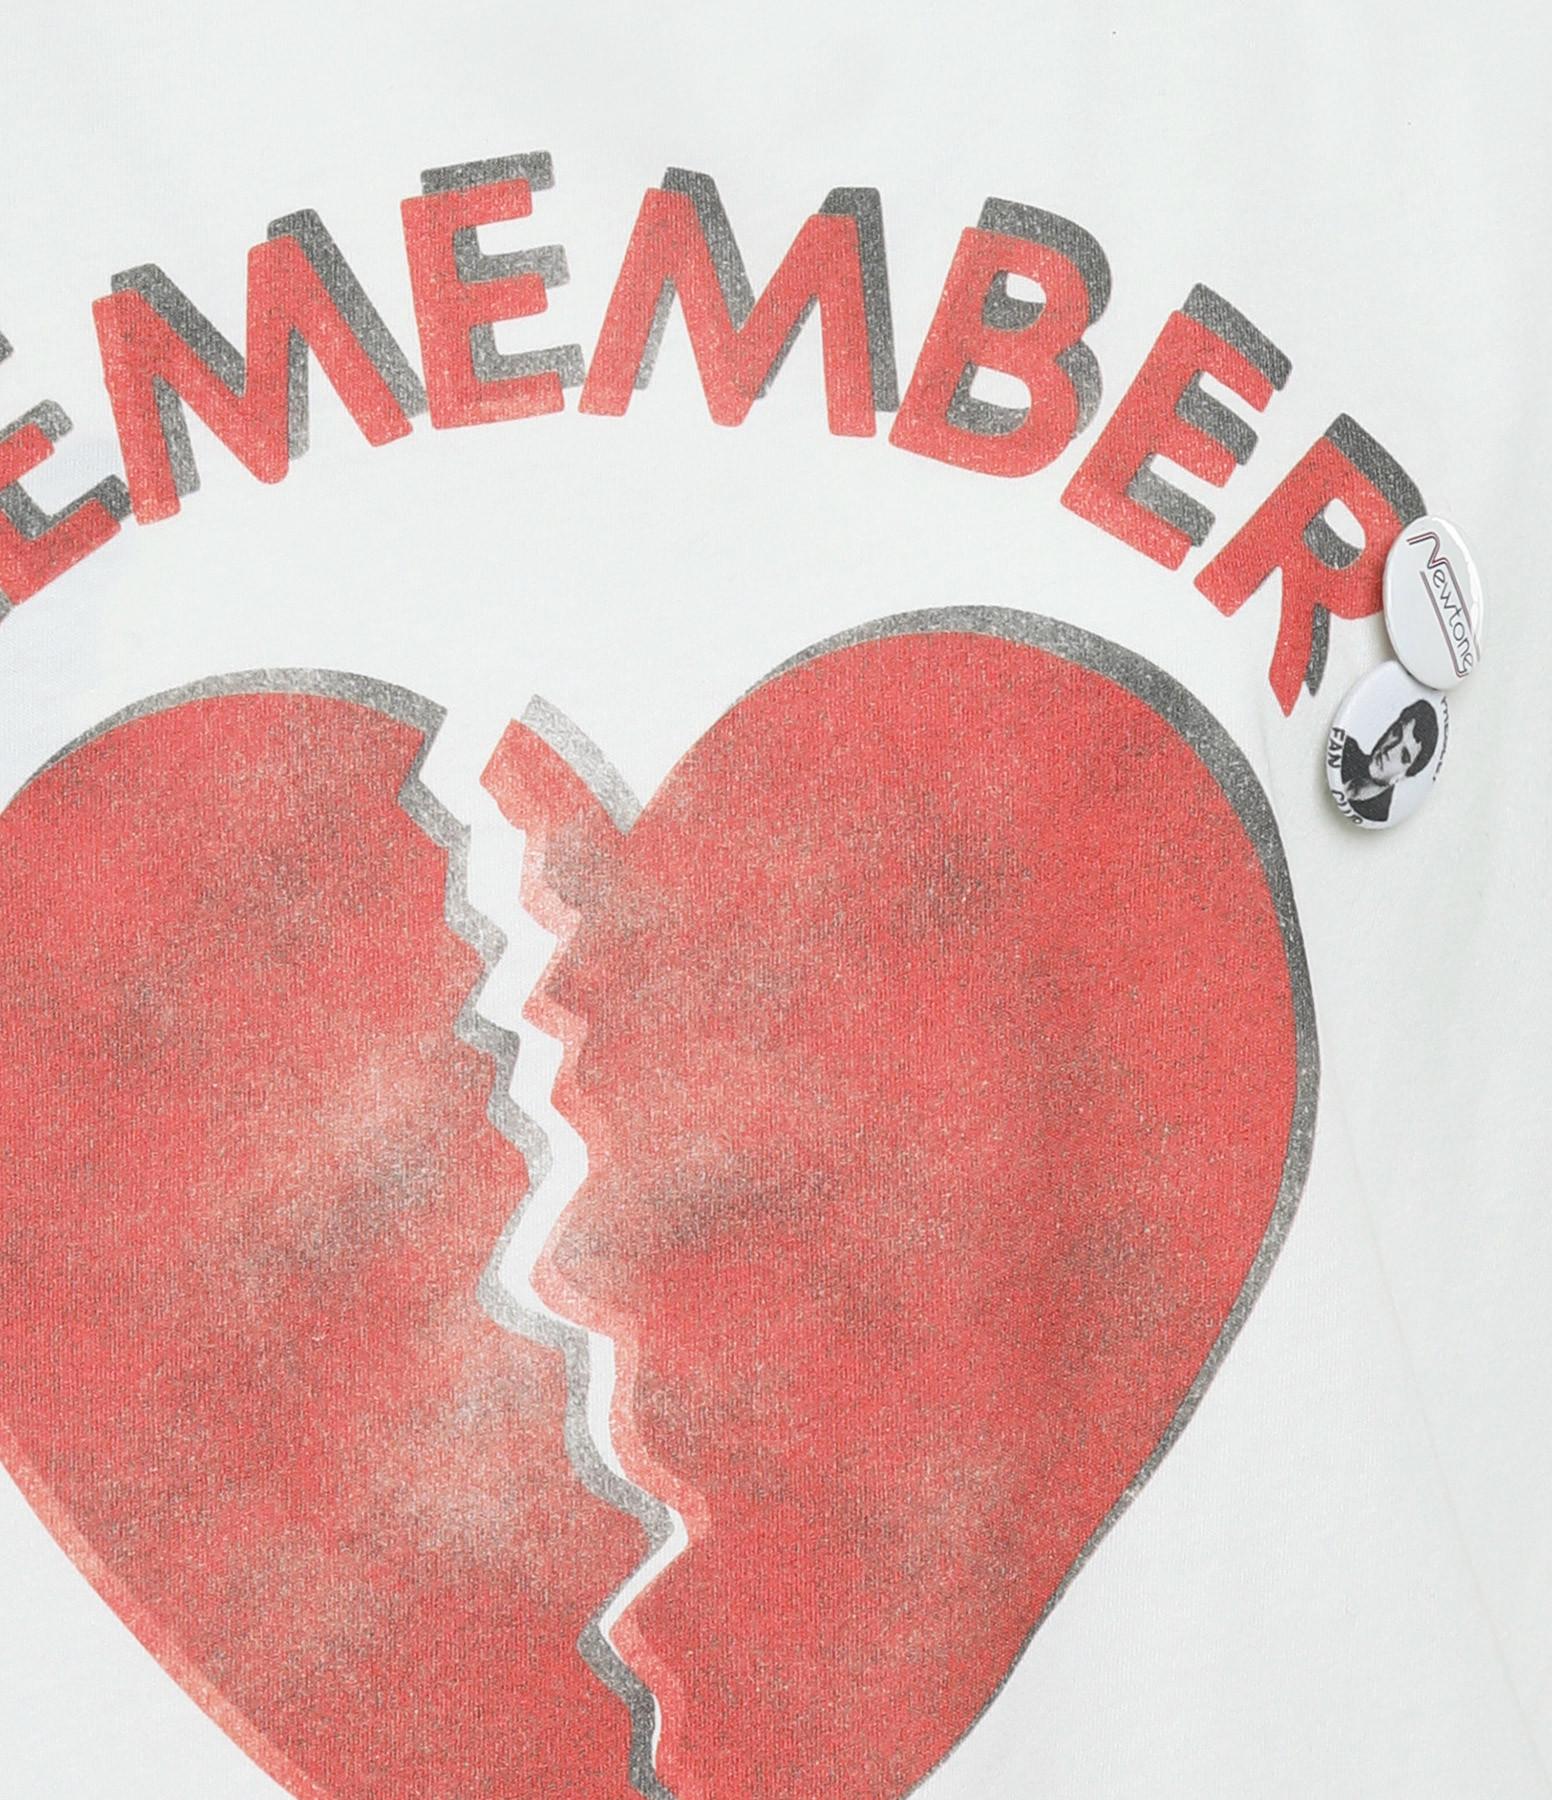 NEWTONE - Tee-shirt Elvis Remember Coton Blanc